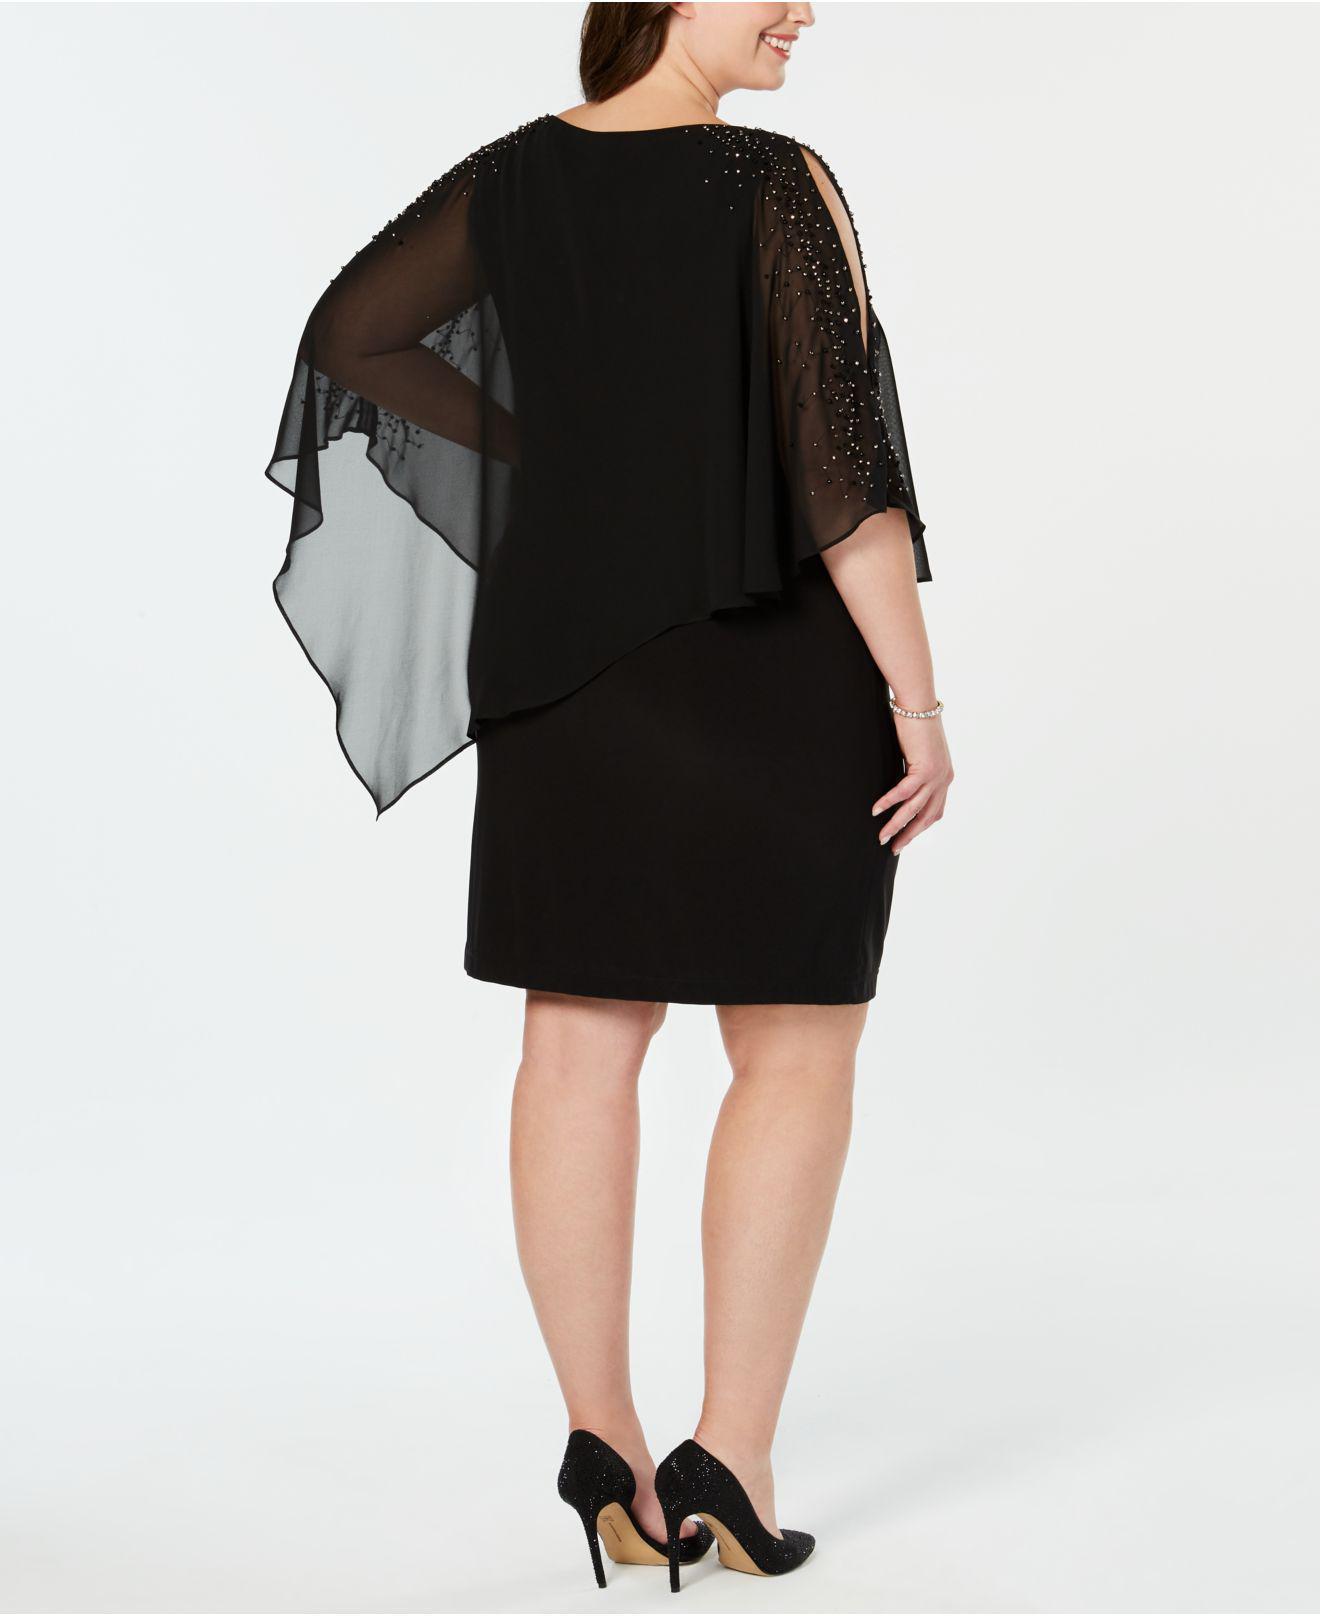 f21c8a4813f49 Lyst Xscape Long Sleeve Beaded Illusion Sheath Dress In Black